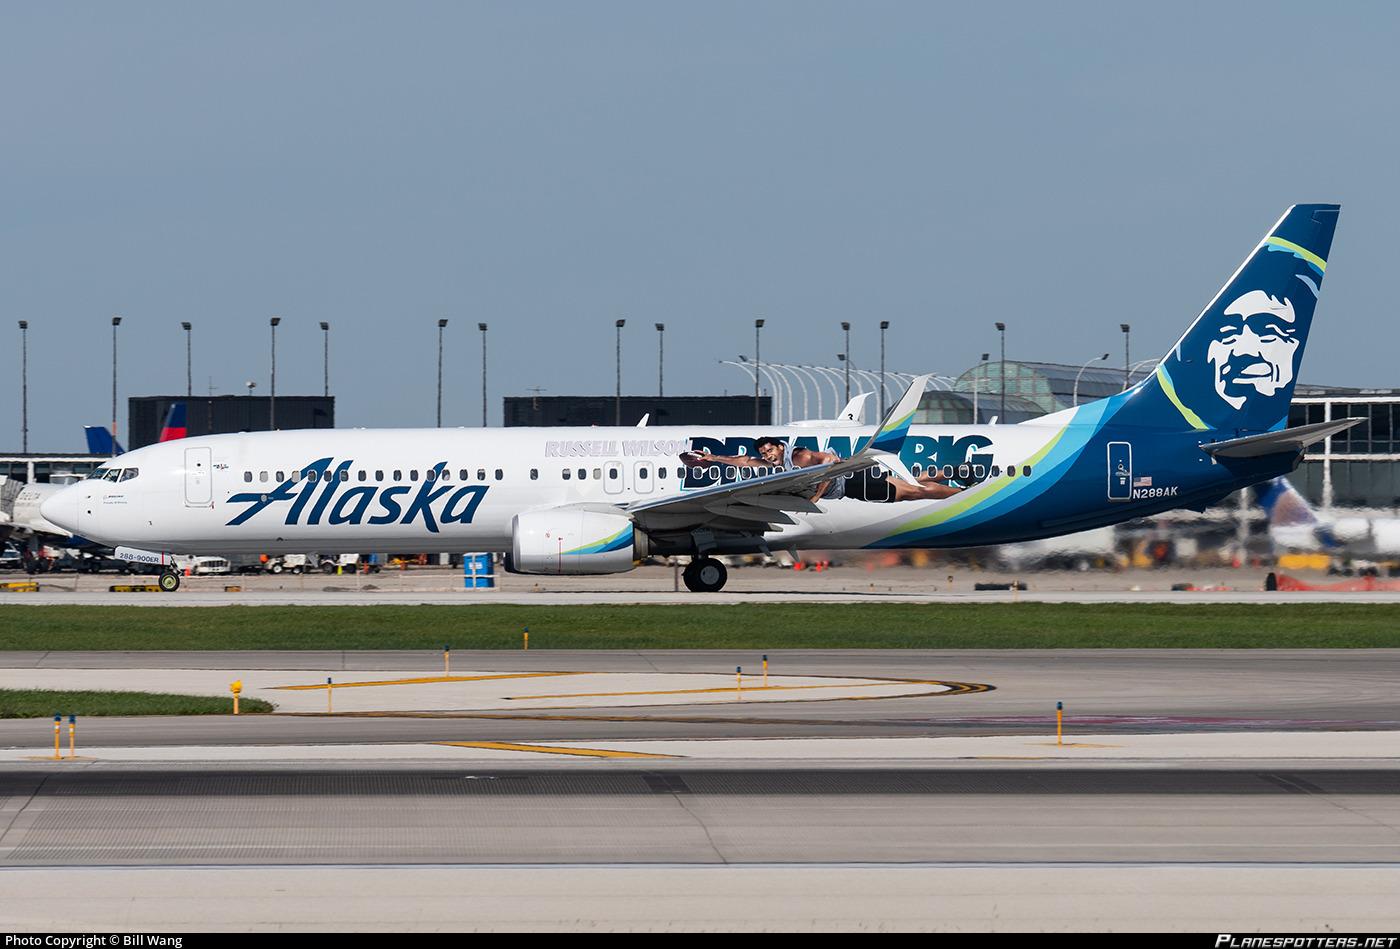 N288ak Alaska Airlines Boeing 737 990 Er Wl Photo By